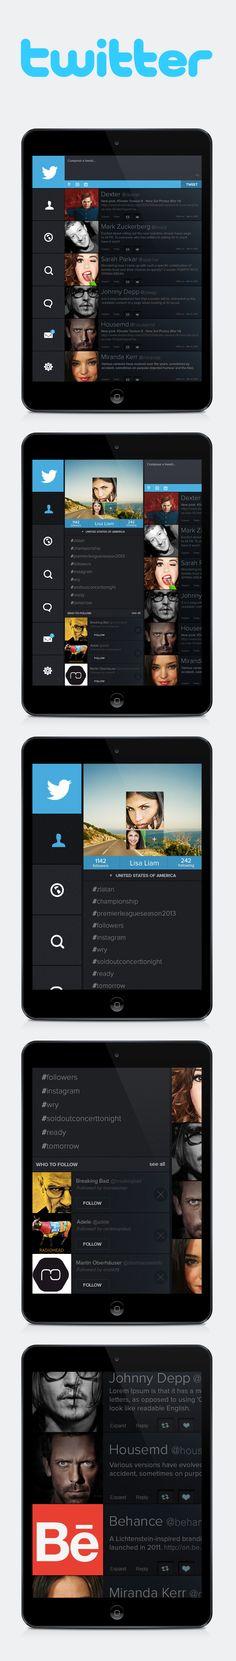 Twitter ipad edition (conception) by Enes Danis, via Behance Flat Web Design, Ux Design, Tablet Ui, Iphone App Design, Mobile Web Design, App Design Inspiration, Ui Web, Ipad App, App Ui